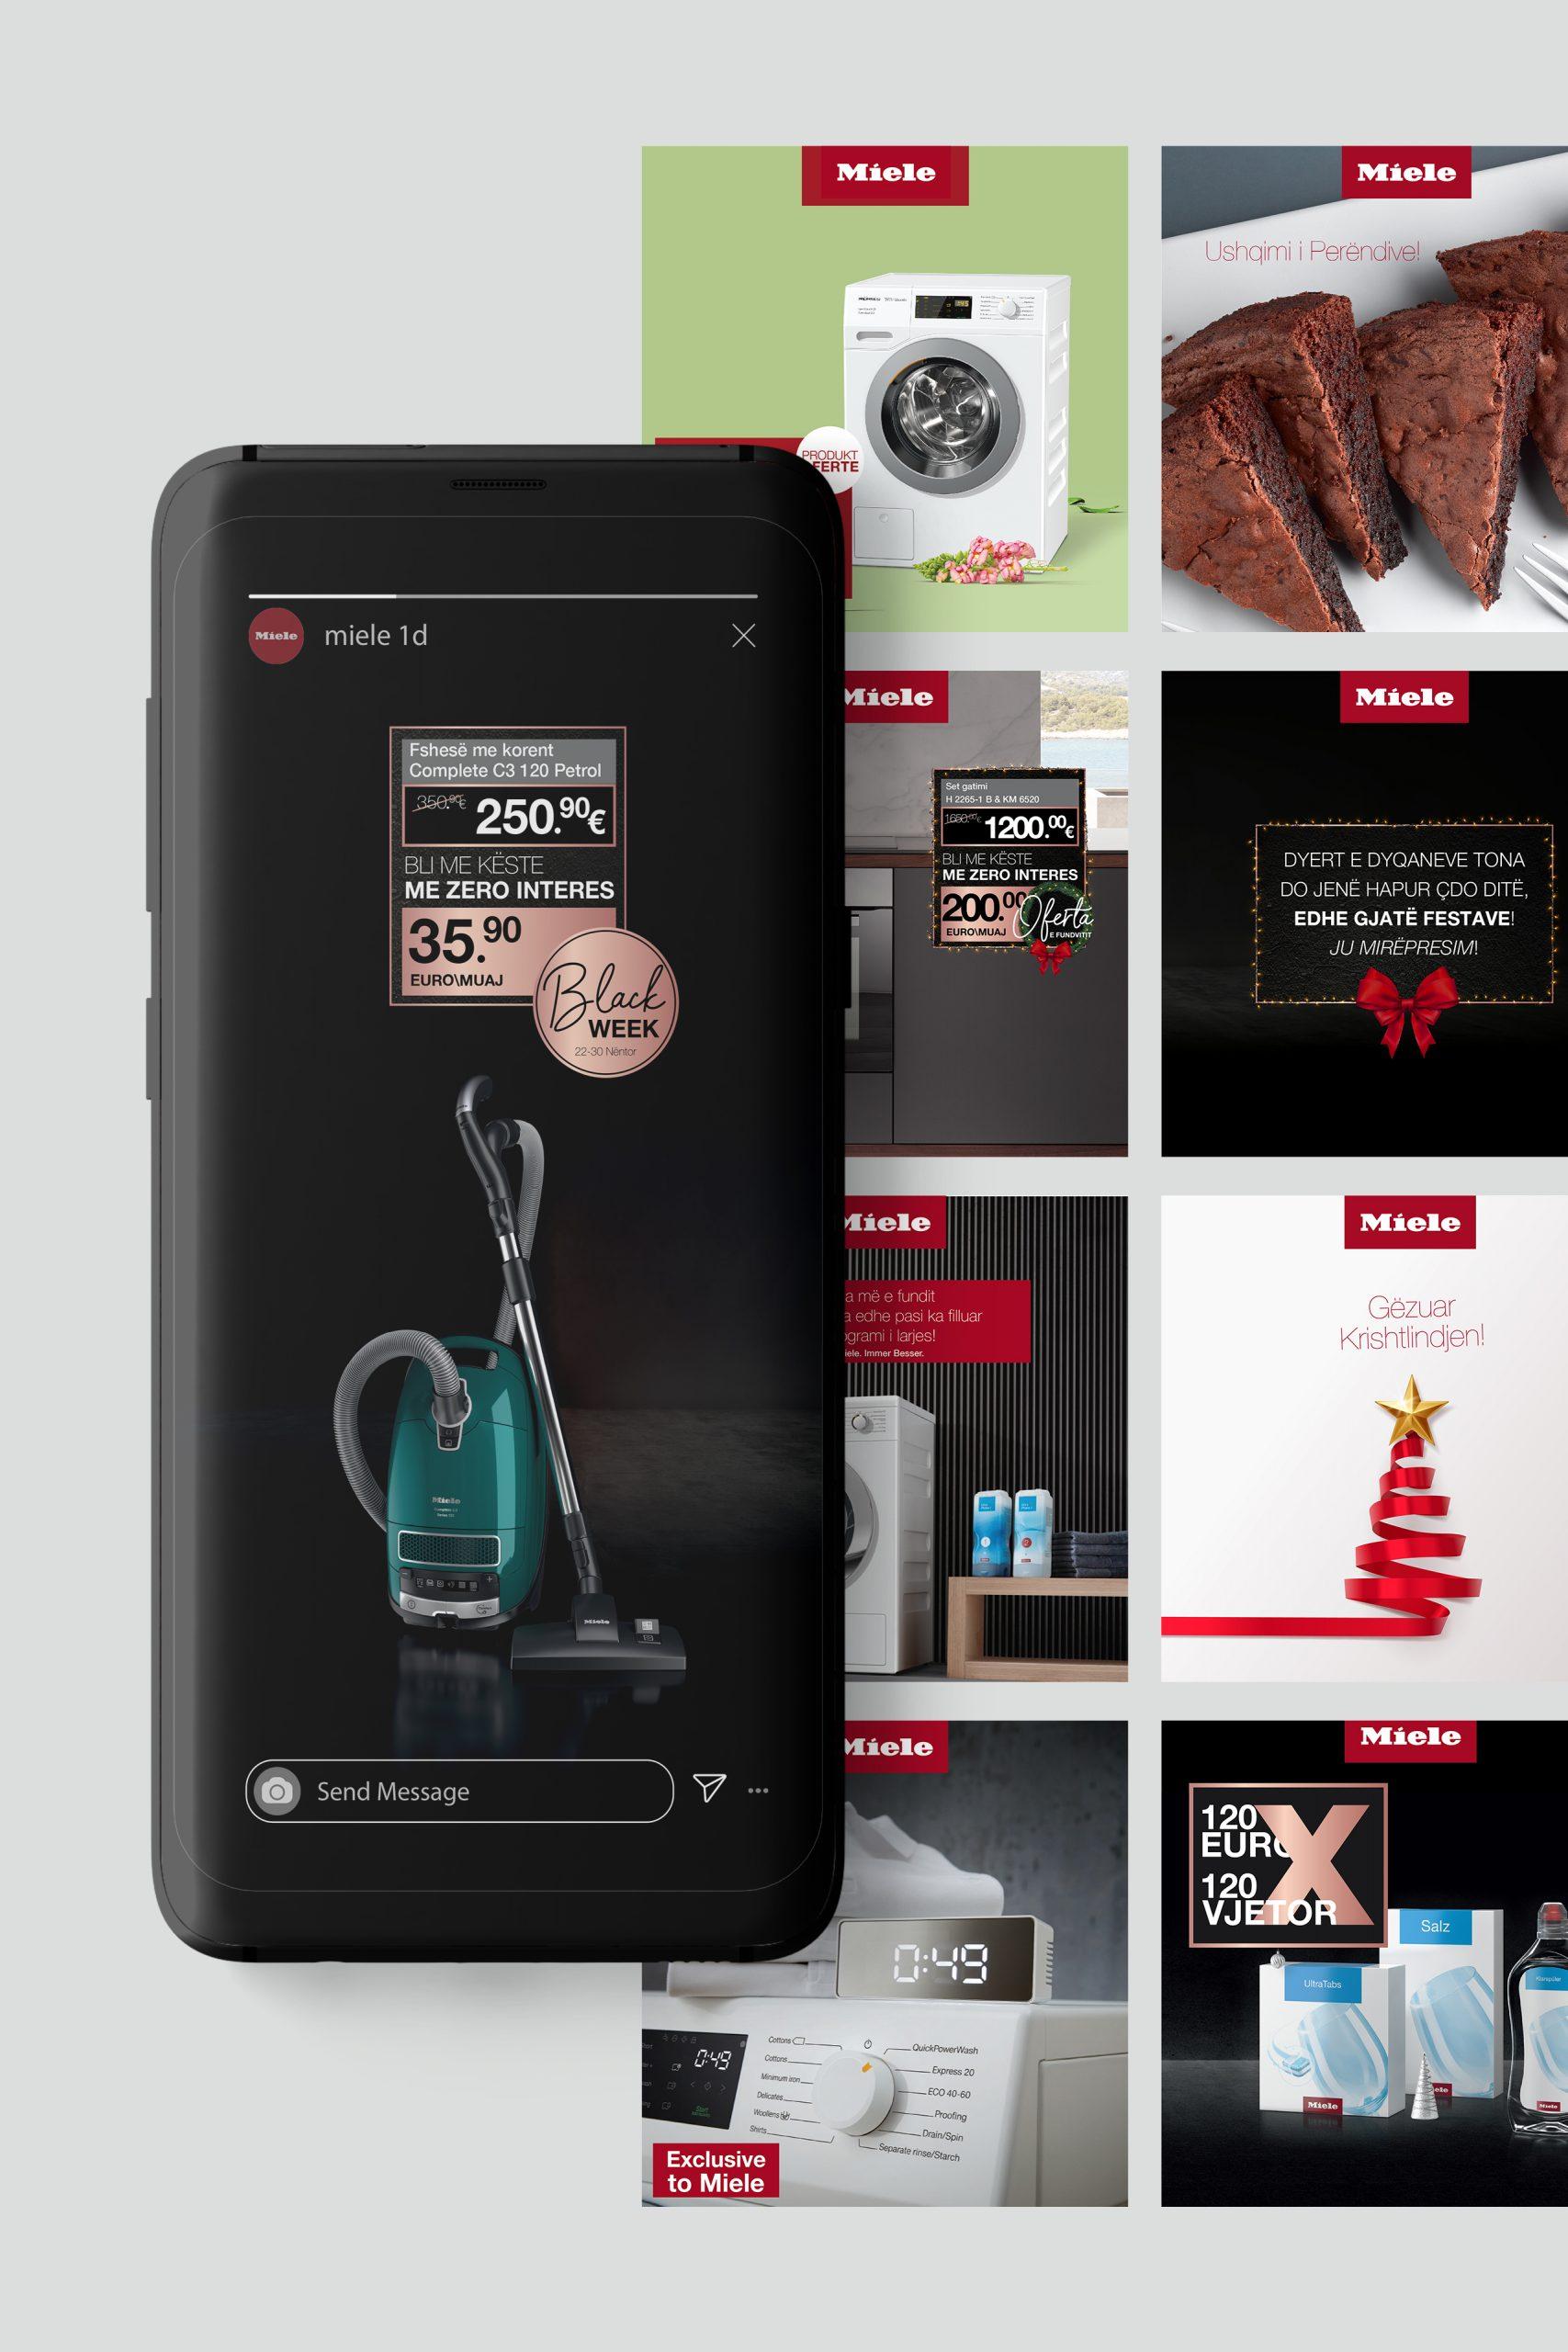 KFC Albania, Project Img 5 - Vatra Agency / Founder & CEO Gerton Bejo